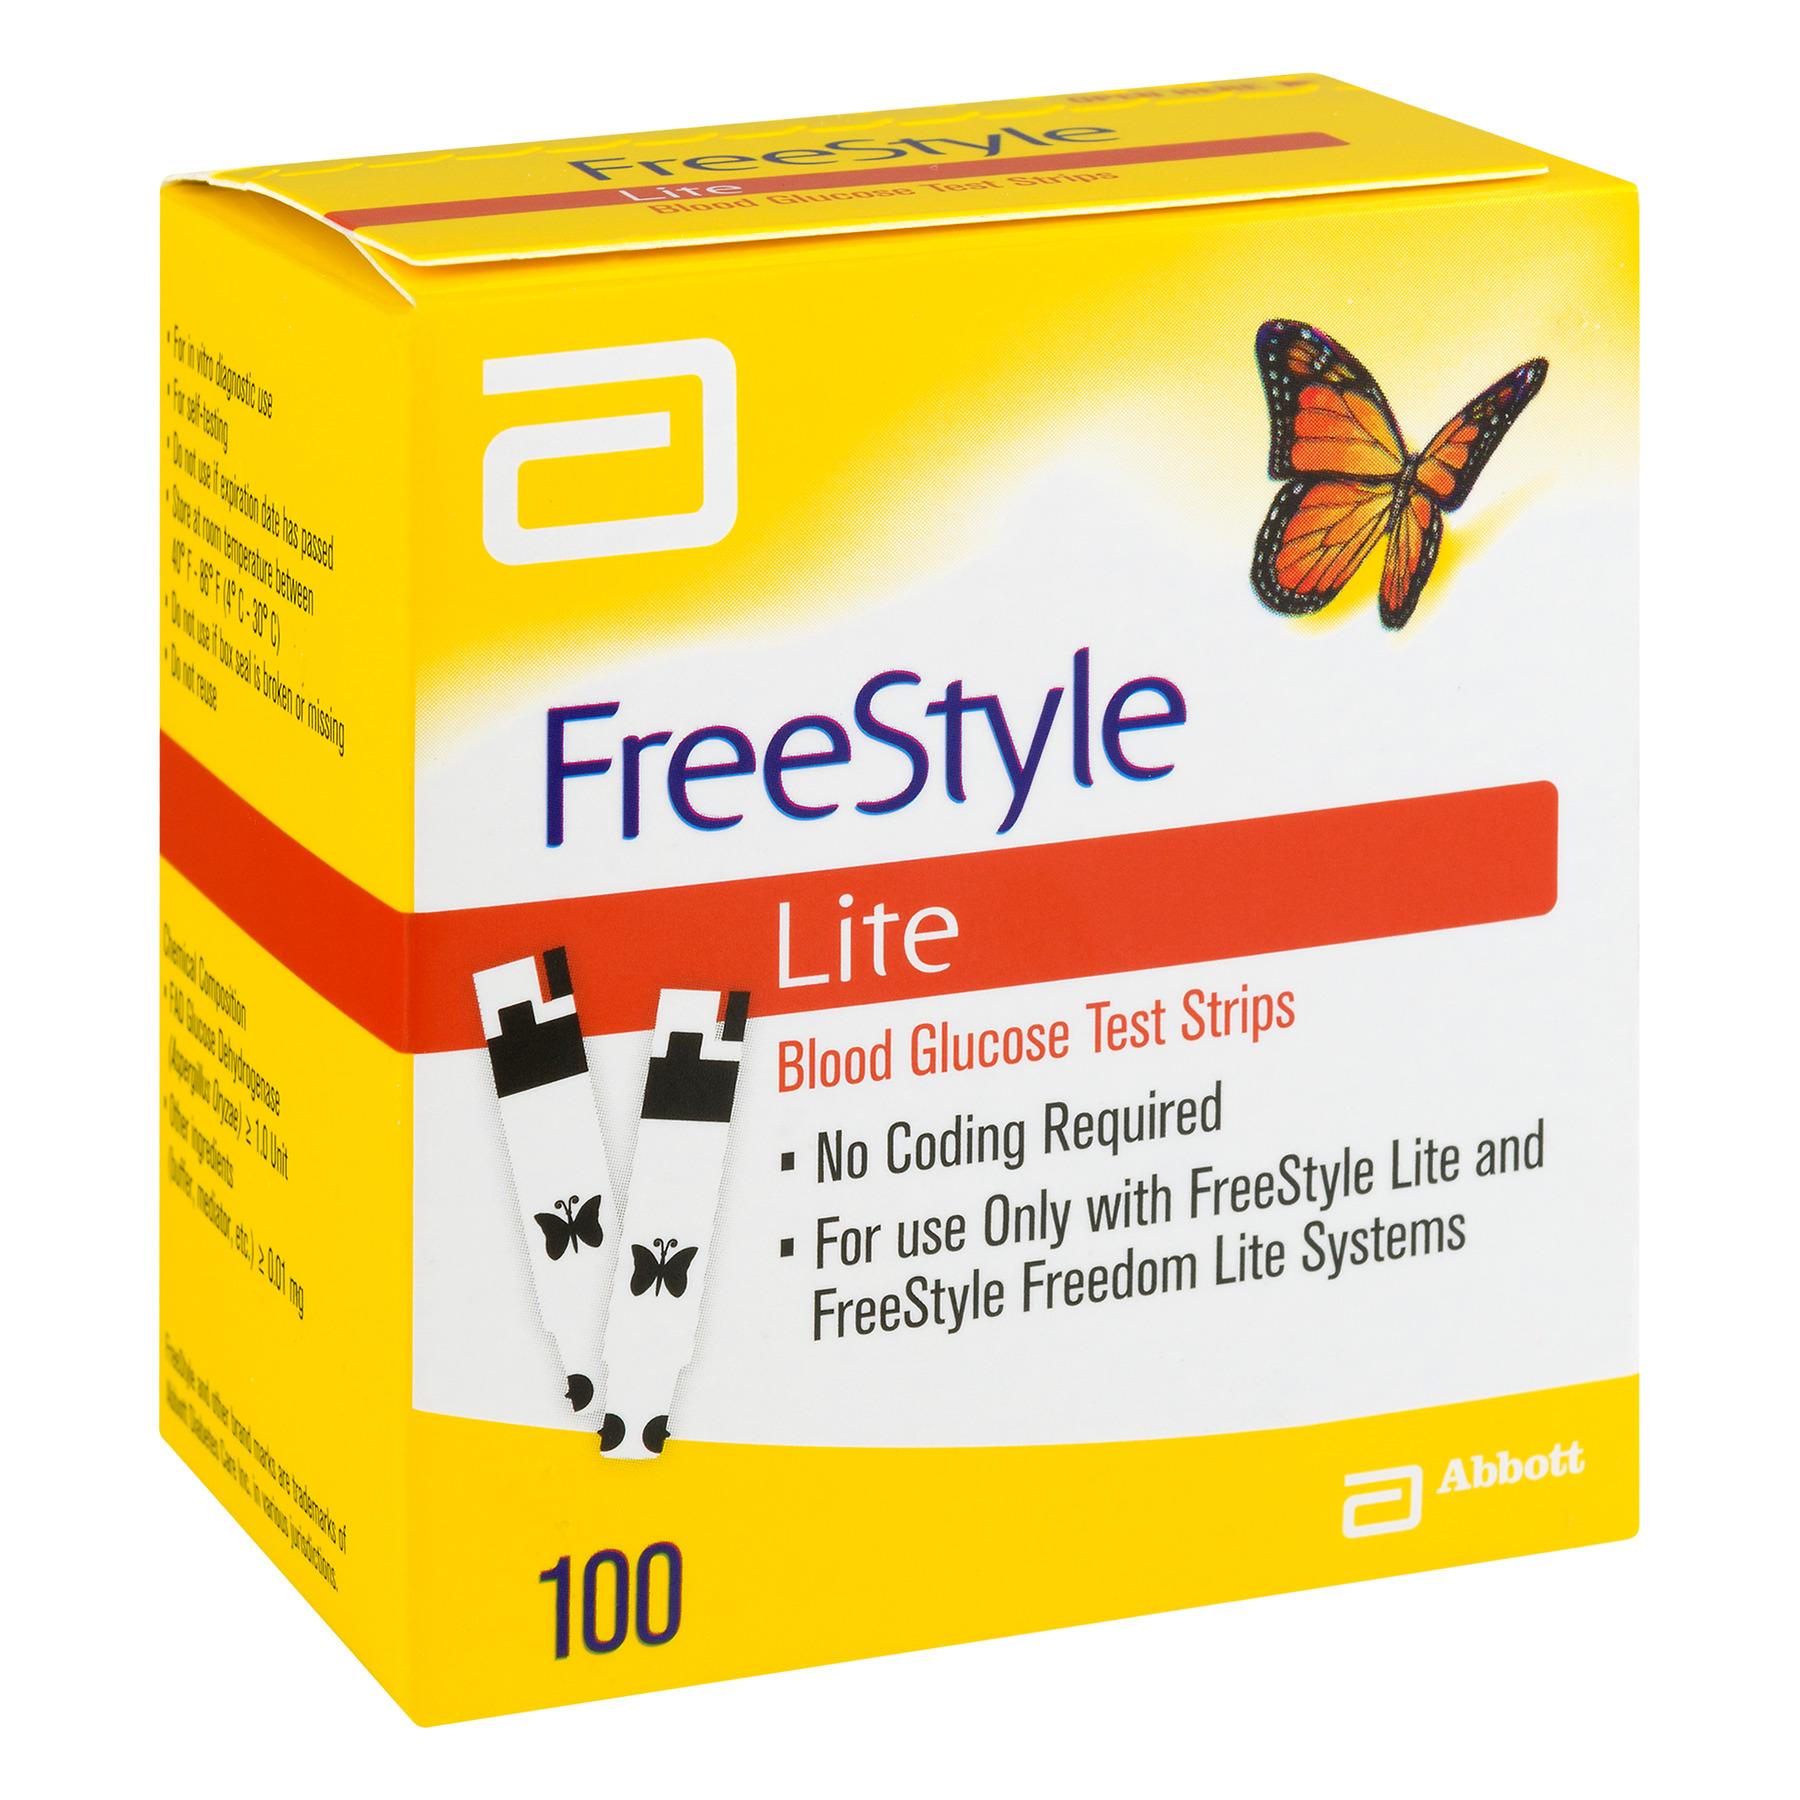 FreeStyle Lite Blood Glucose Test Strips, 100 Ct